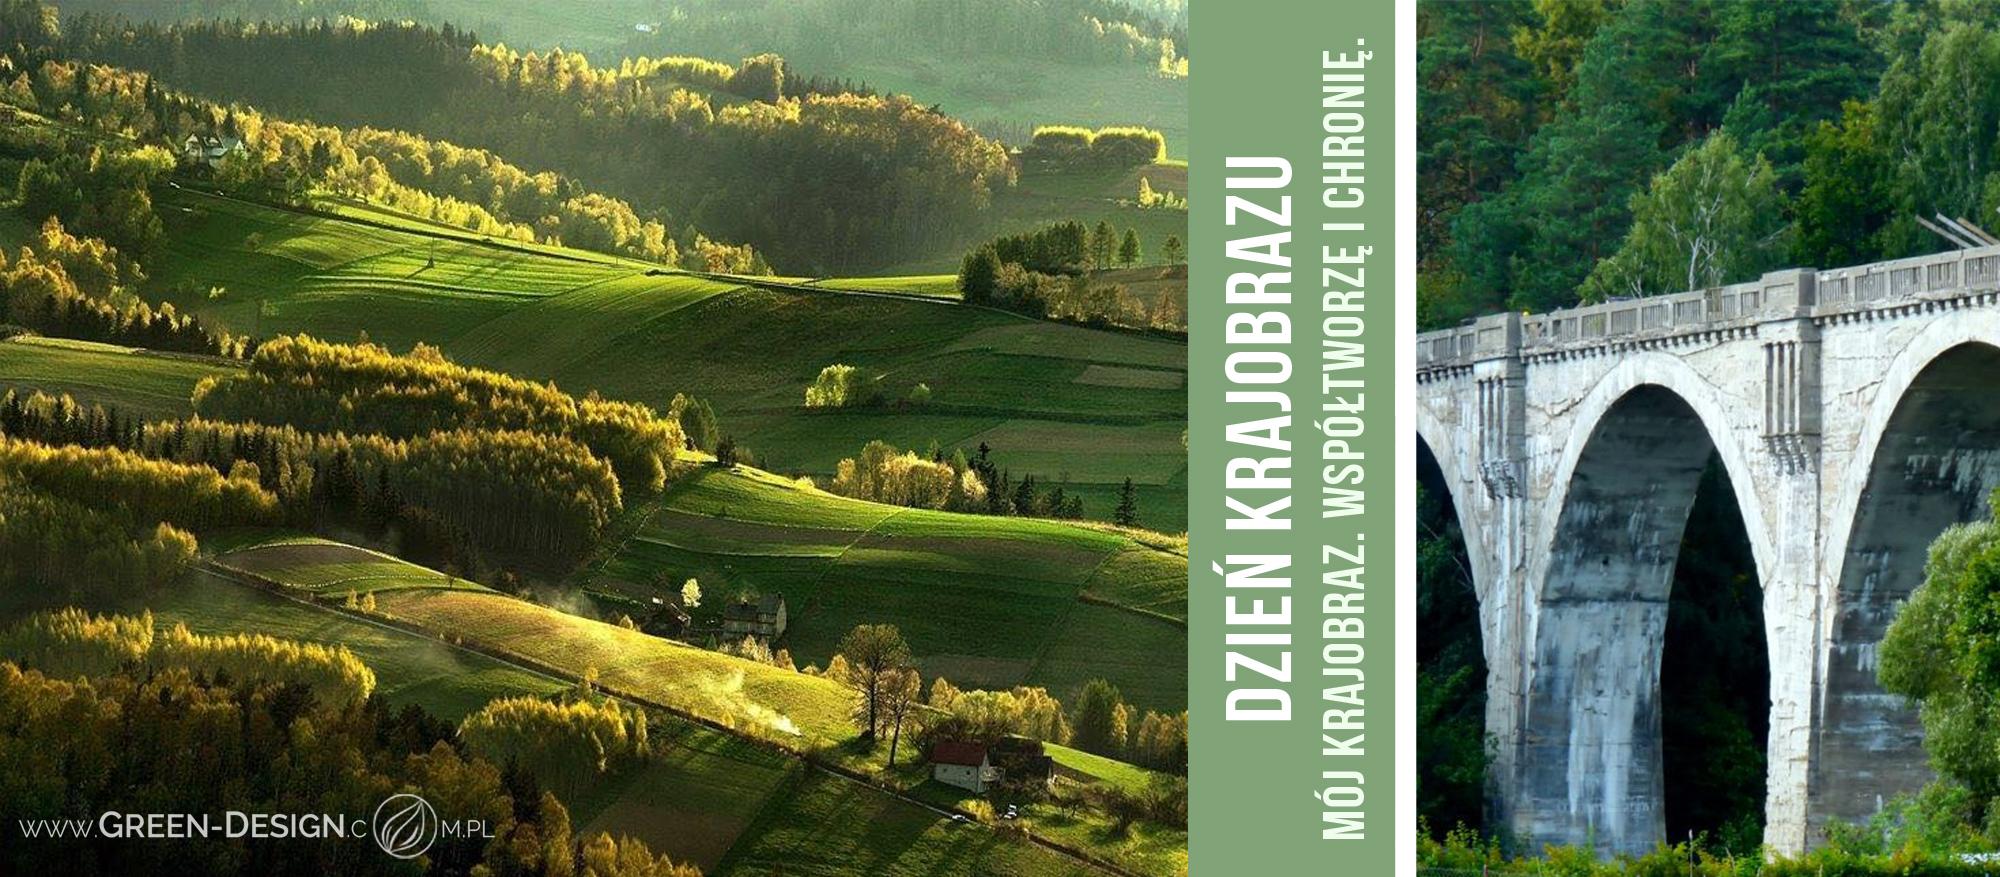 dzien-krajobrazu_cover_photo2